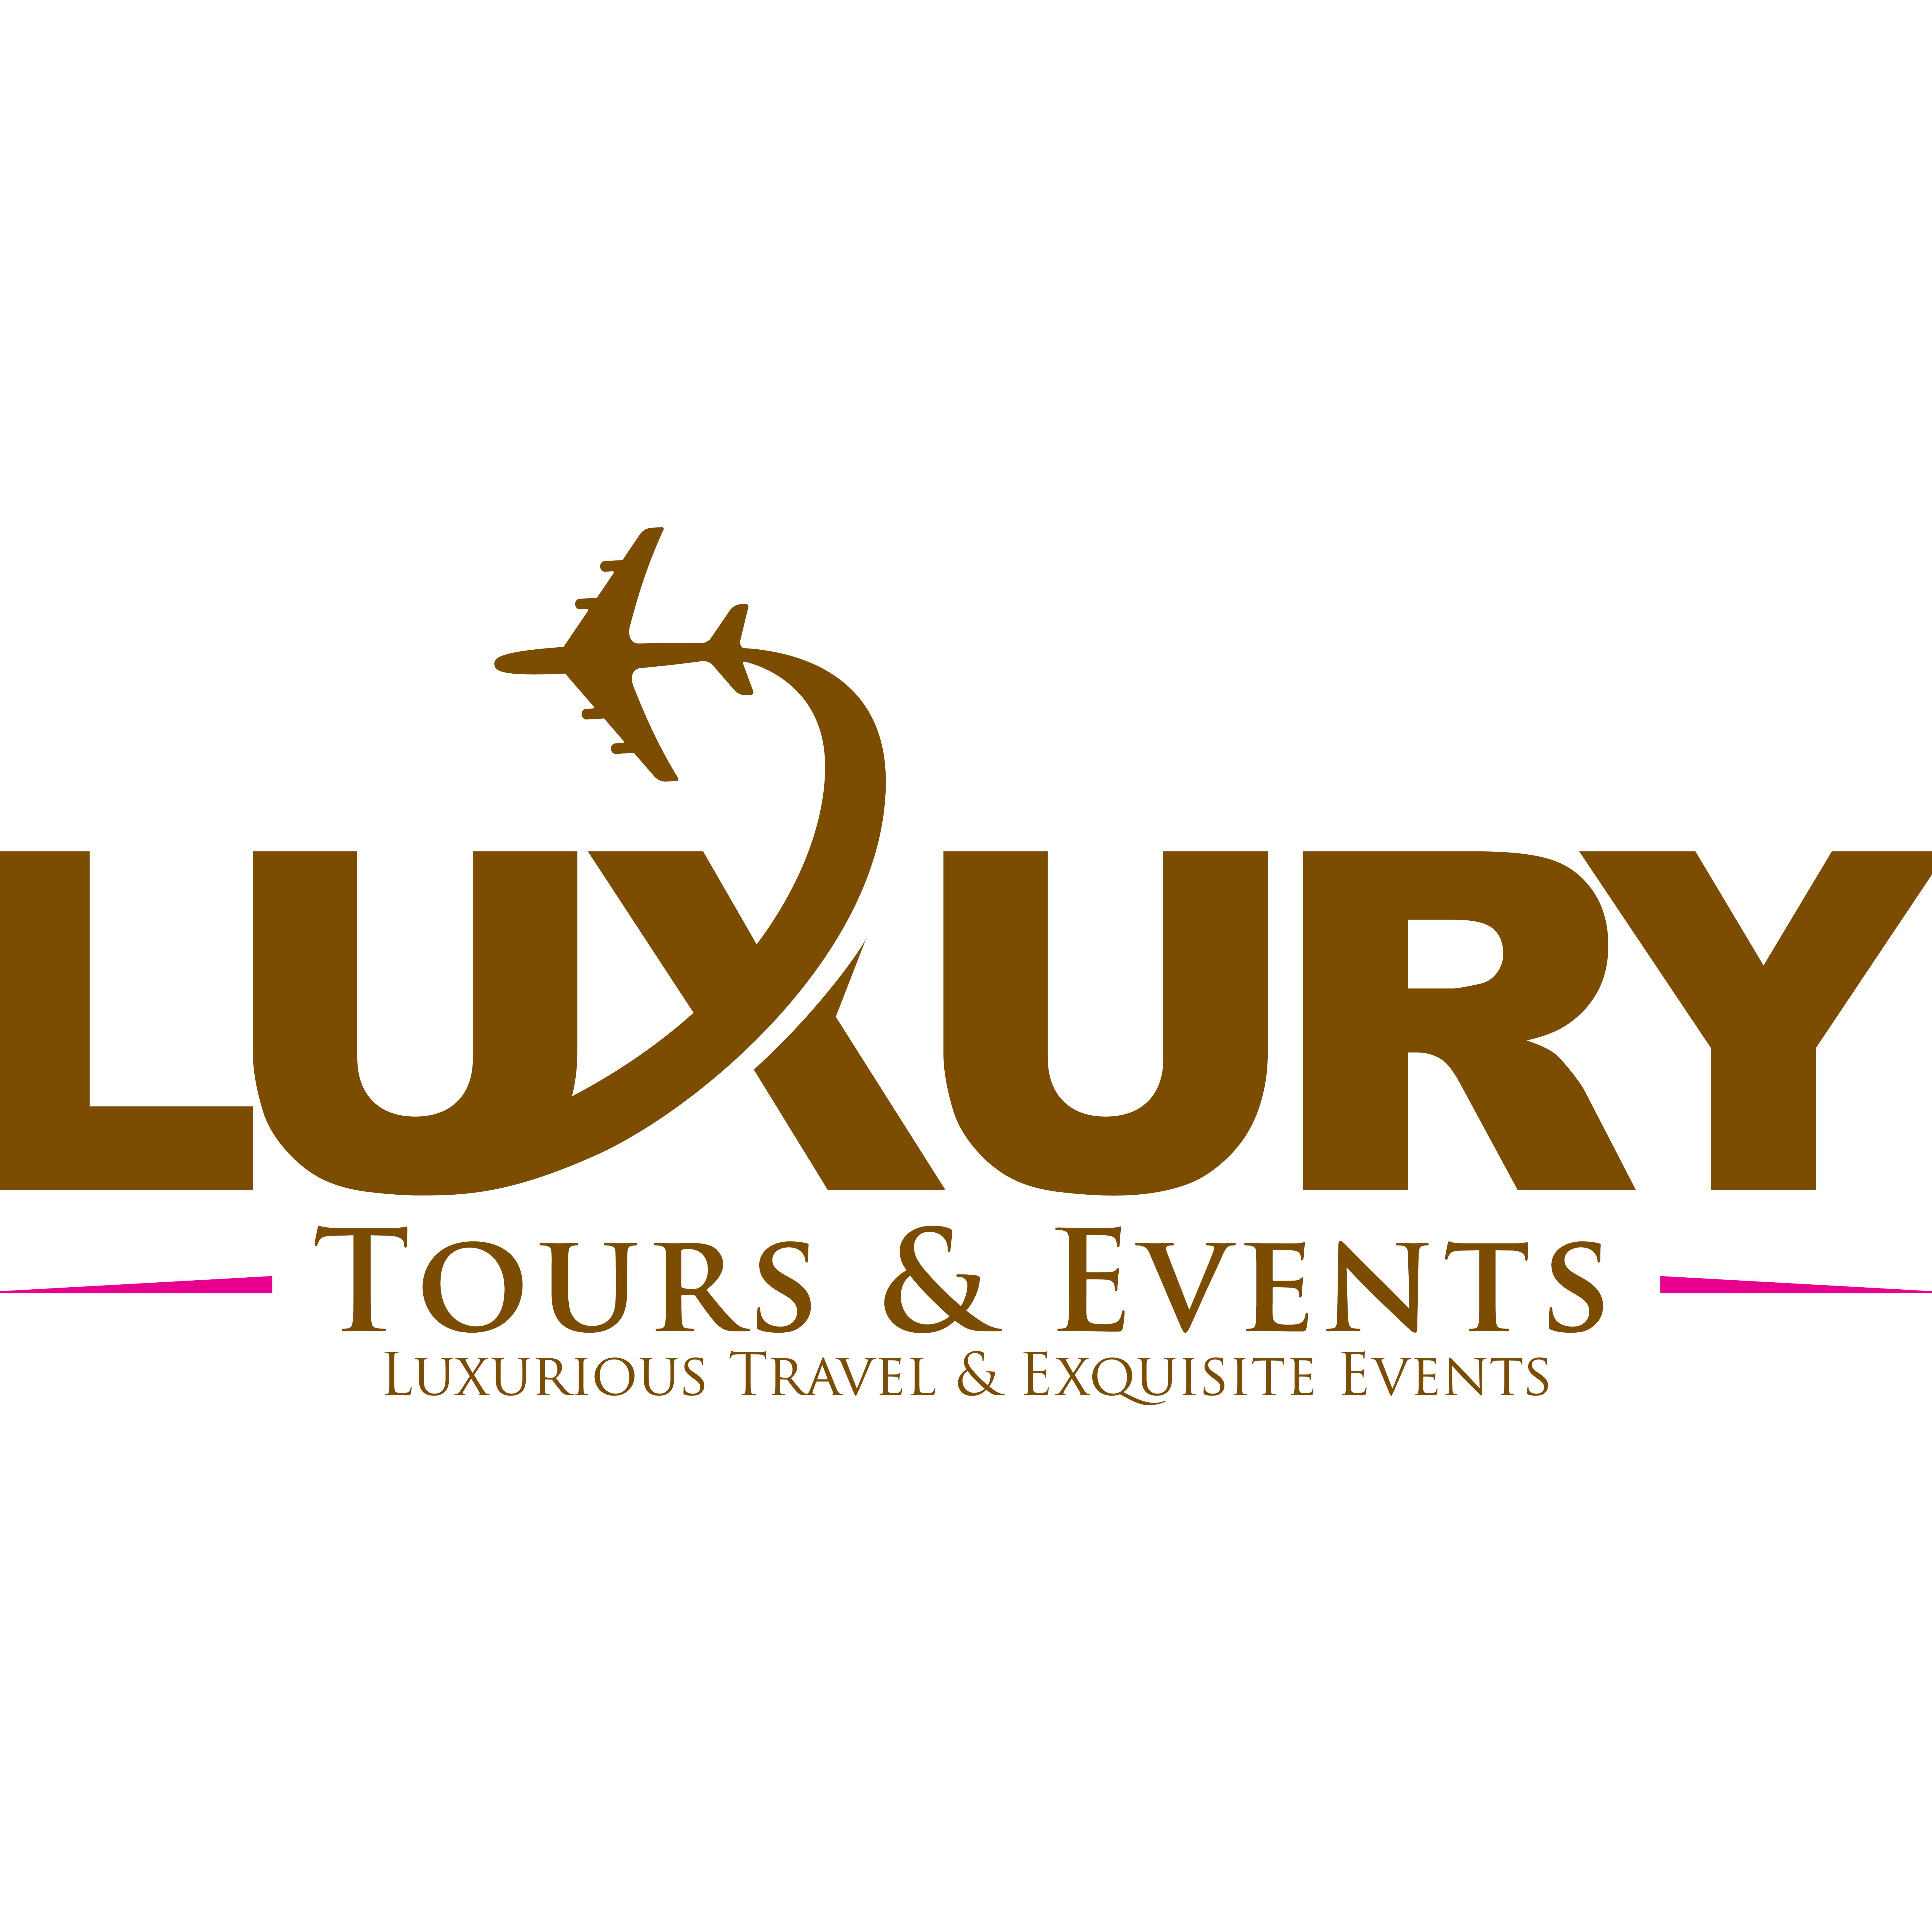 Luxury Tours & Events image 0